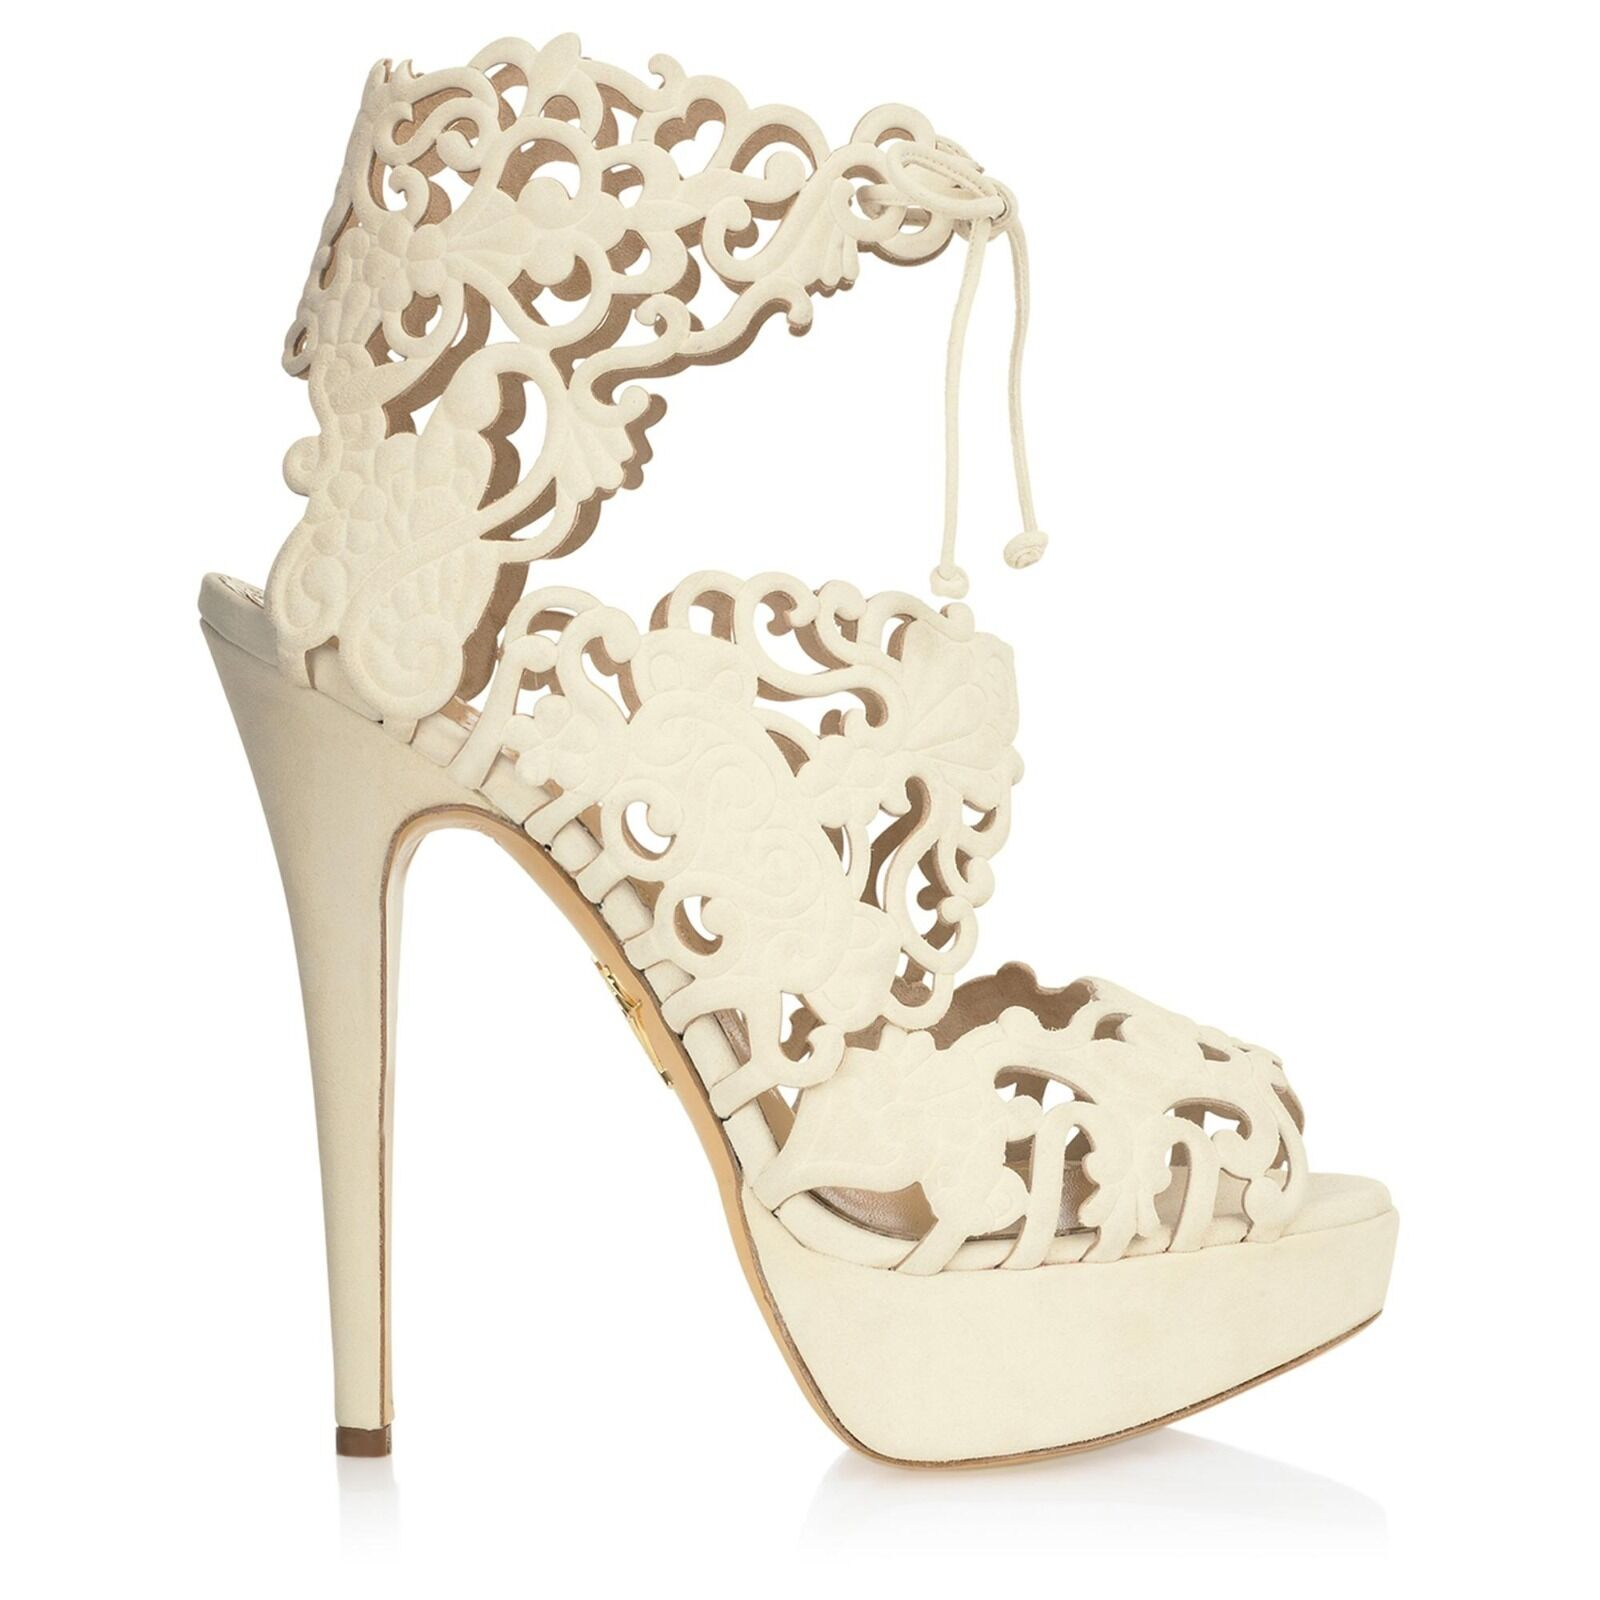 CHARLOTTE OLYMPIA Belinda cut mocka sandaler, storlek 35, NIB